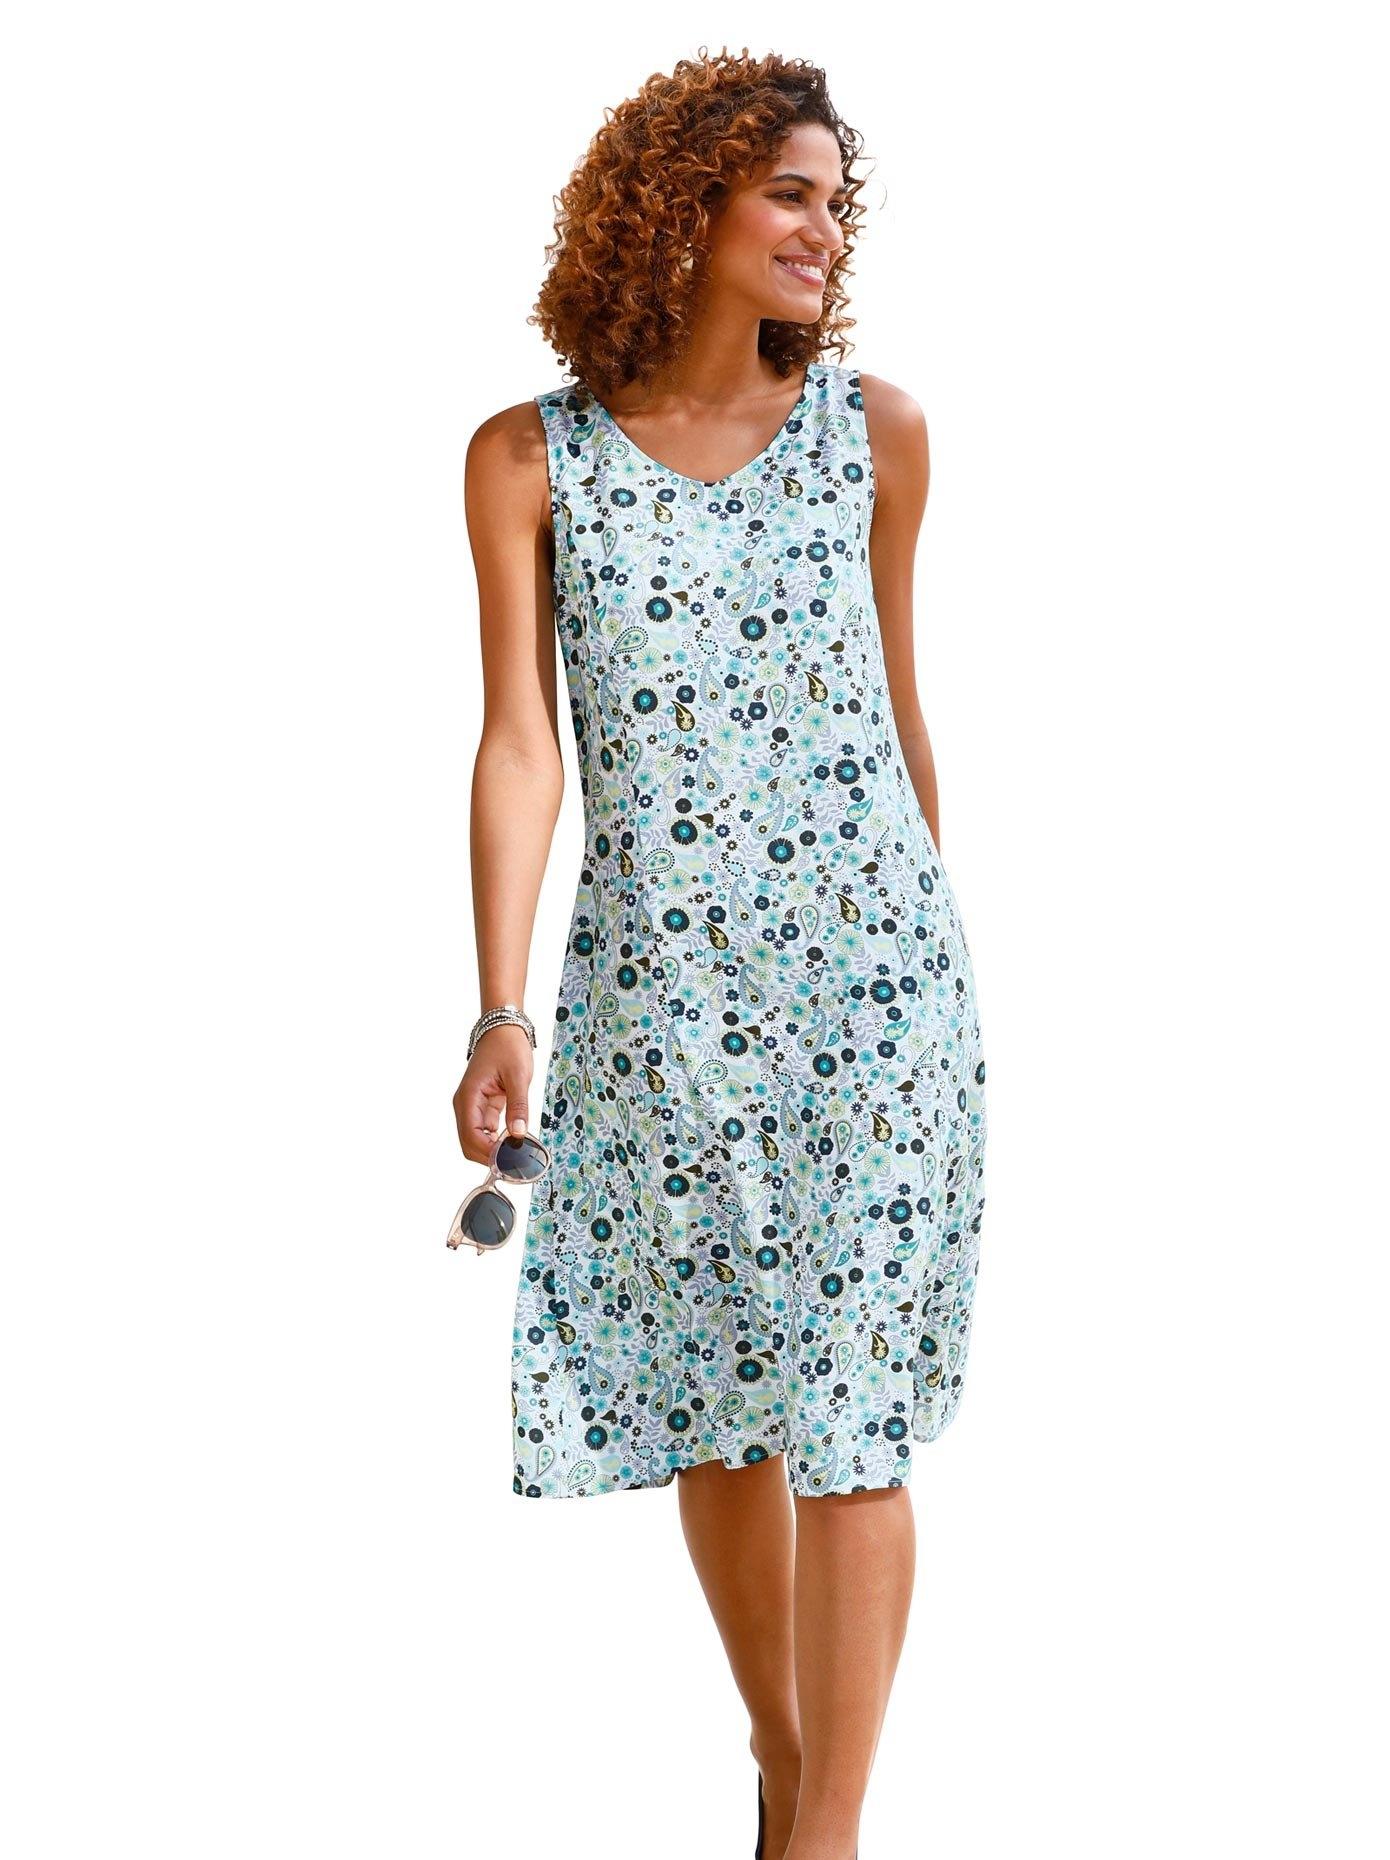 Classic Basics gedessineerde jurk Jurk - verschillende betaalmethodes